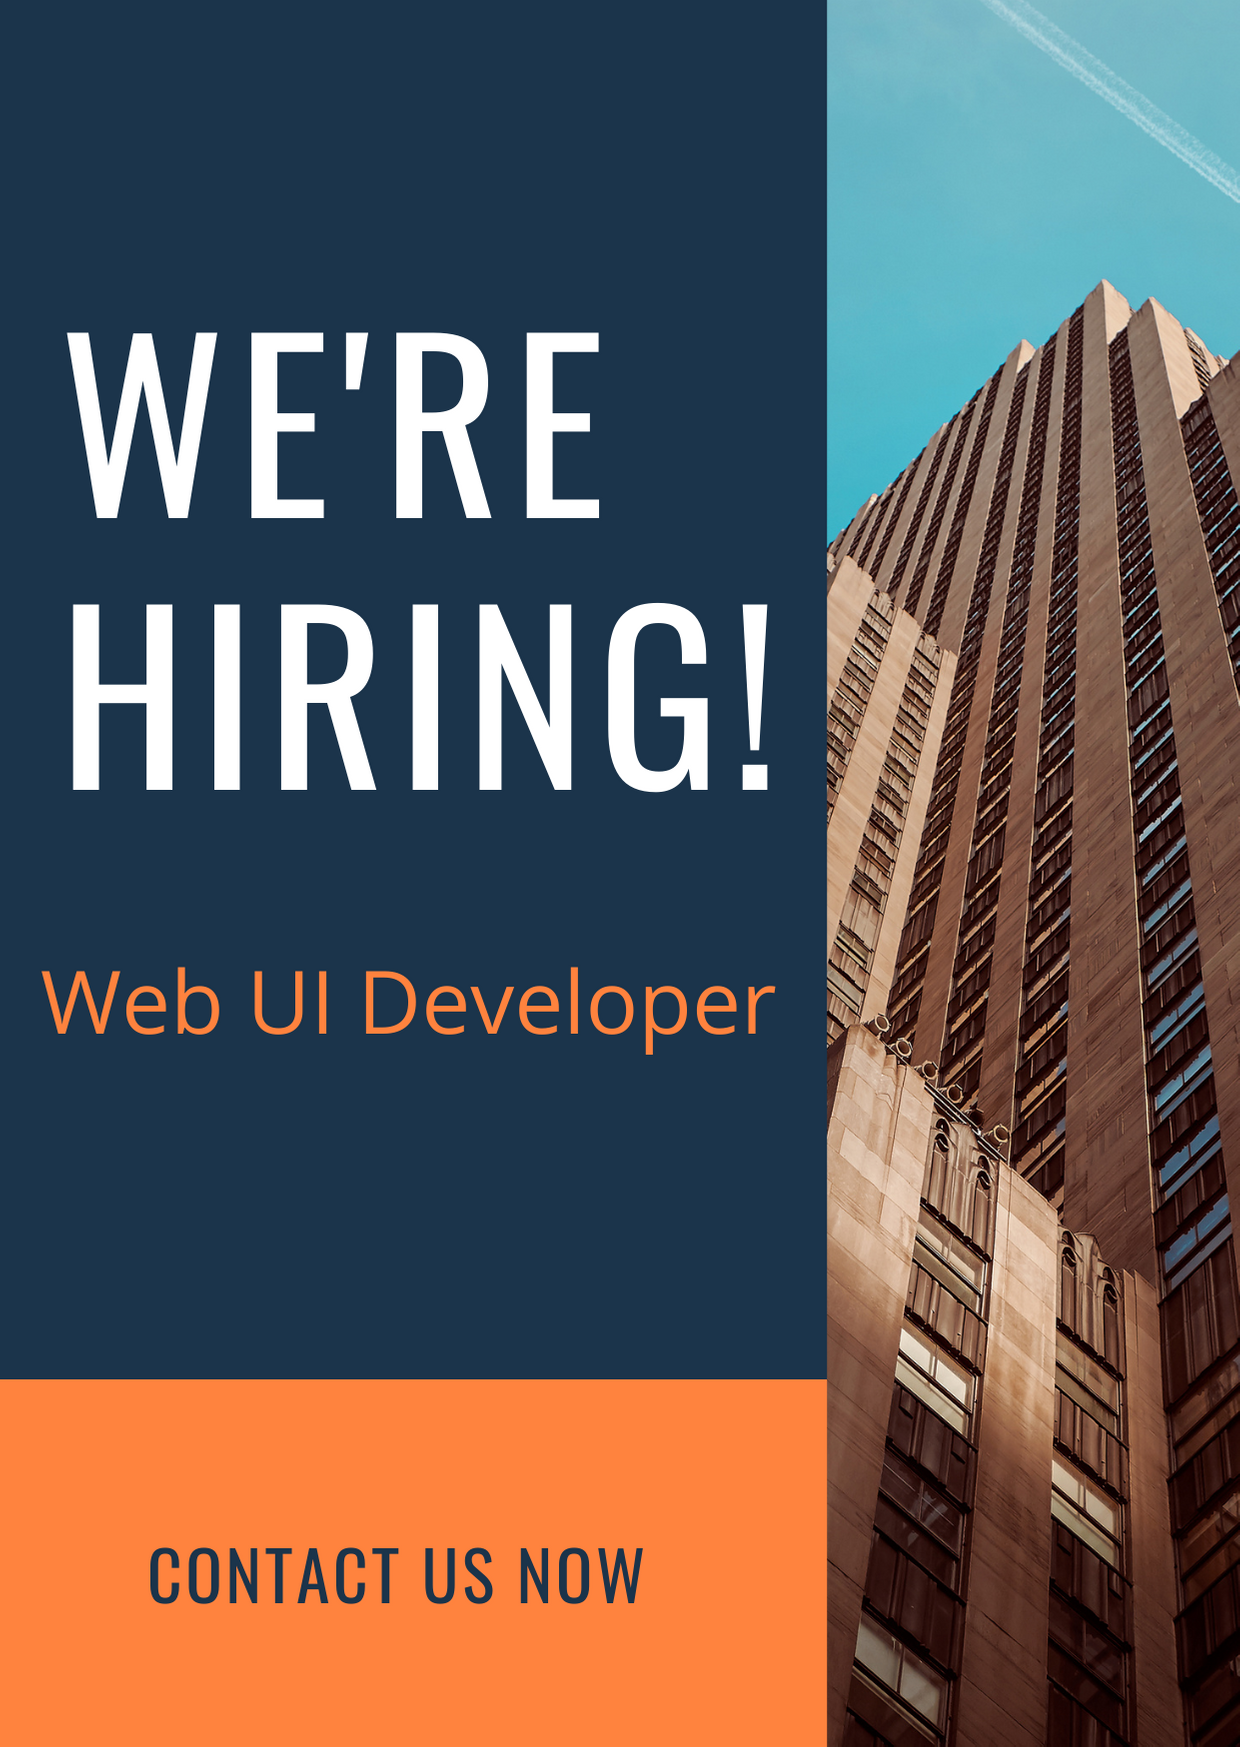 Web UI Developer opening